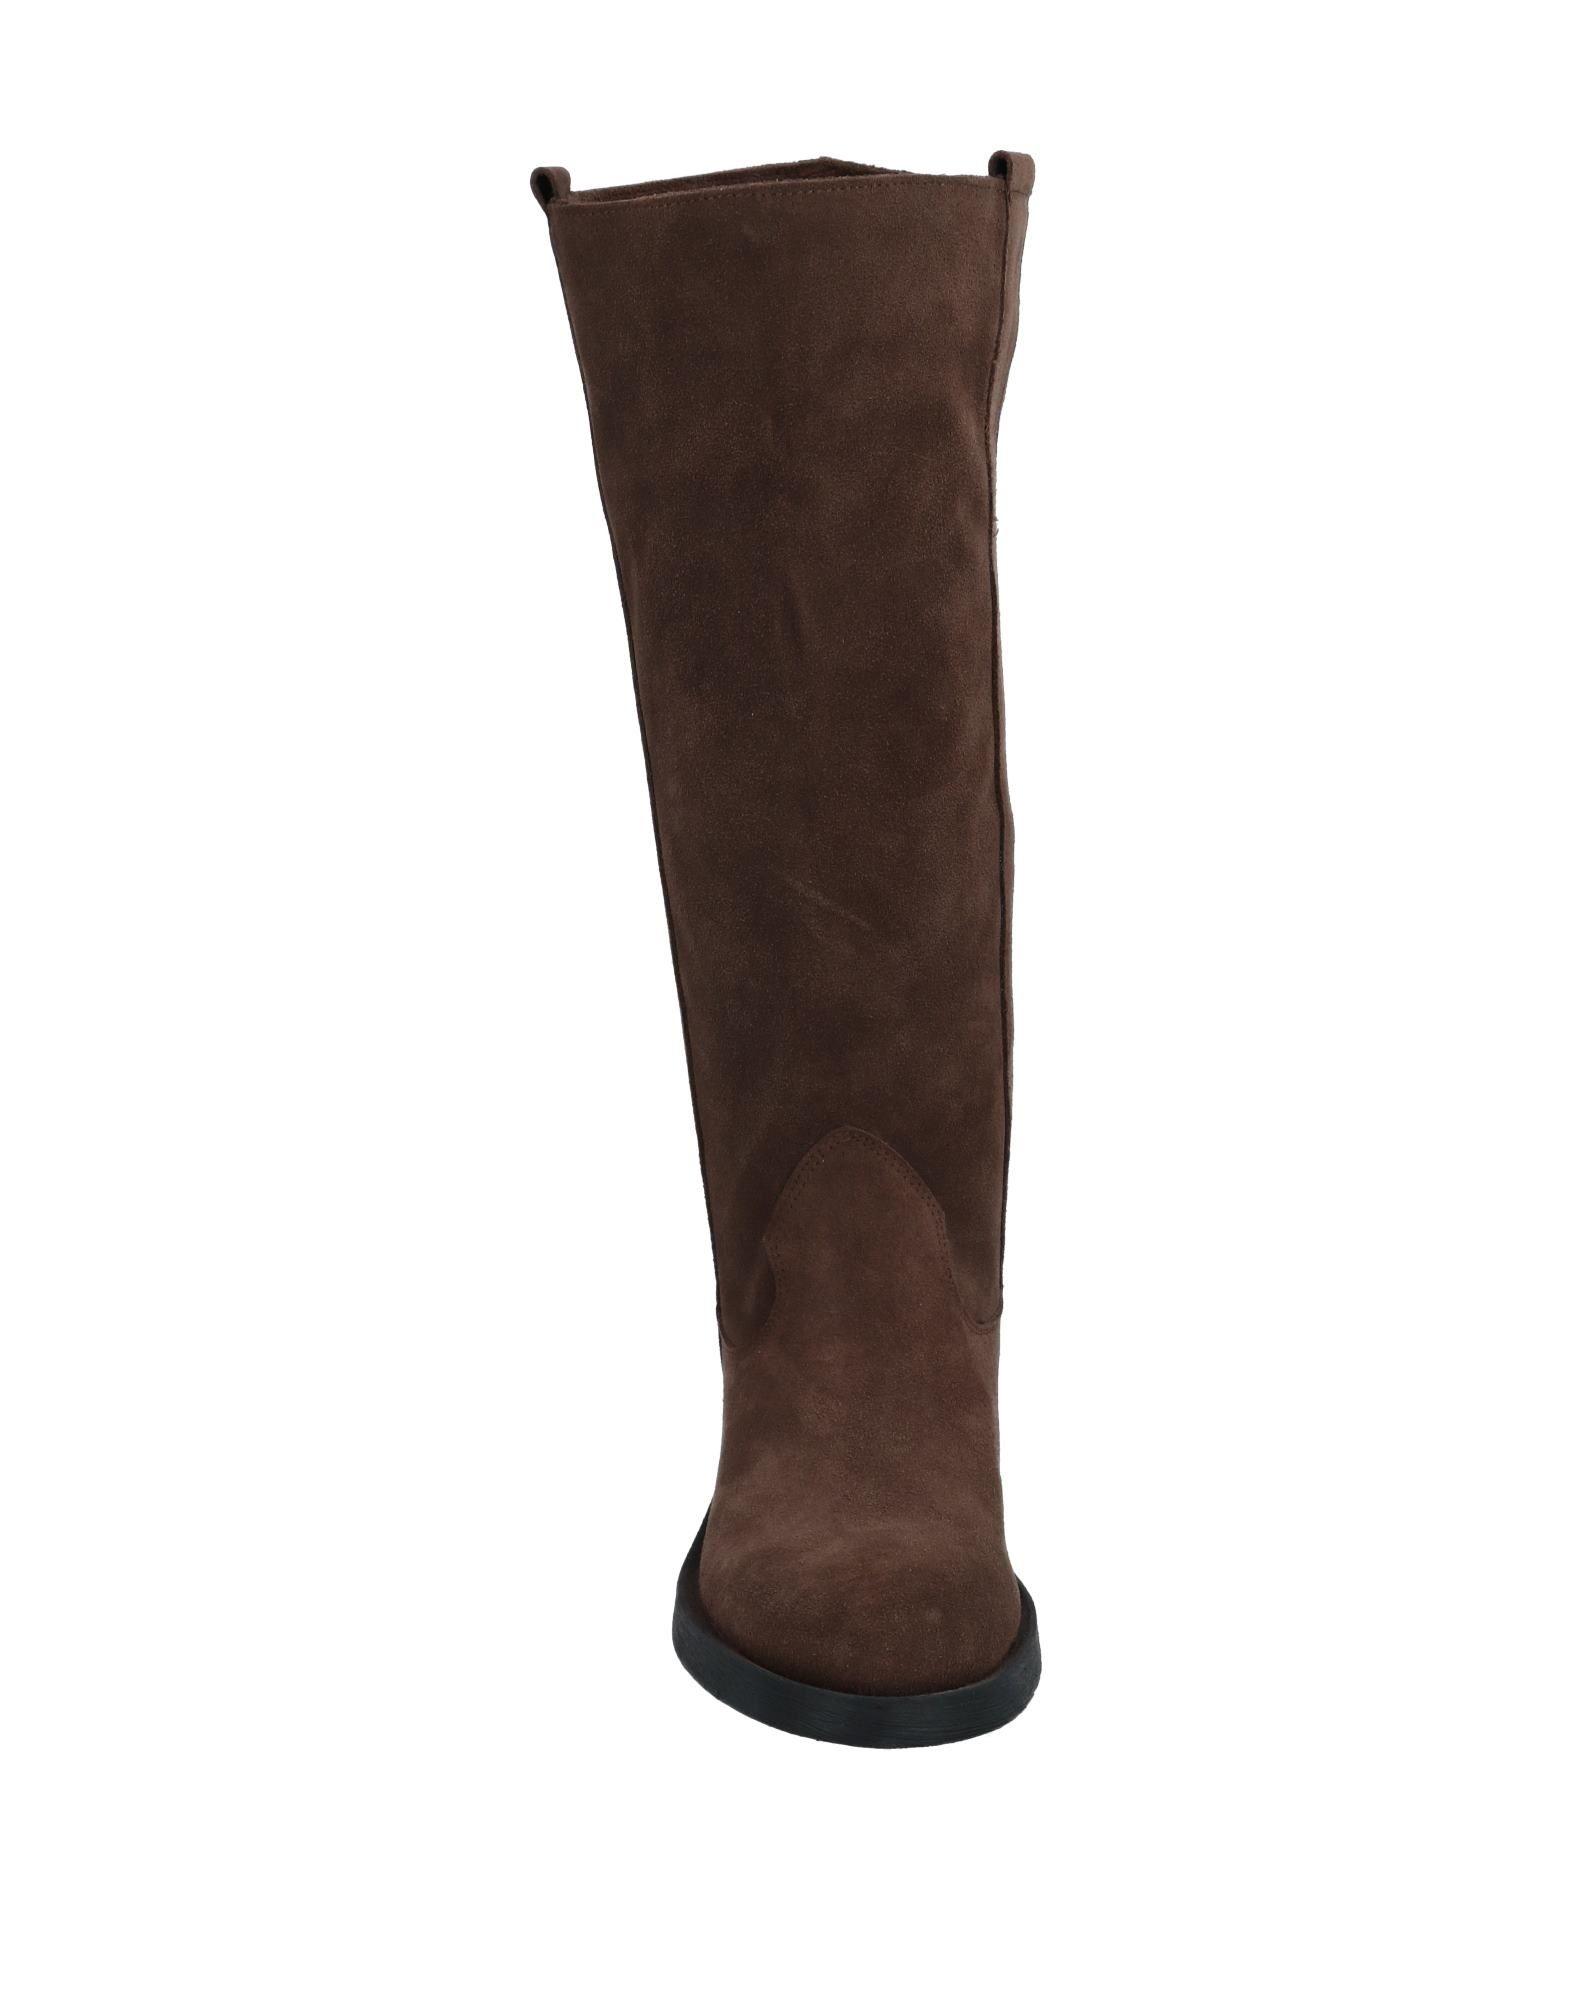 Stilvolle Damen billige Schuhe Unlace Stiefel Damen Stilvolle  11522635FD 3258e2